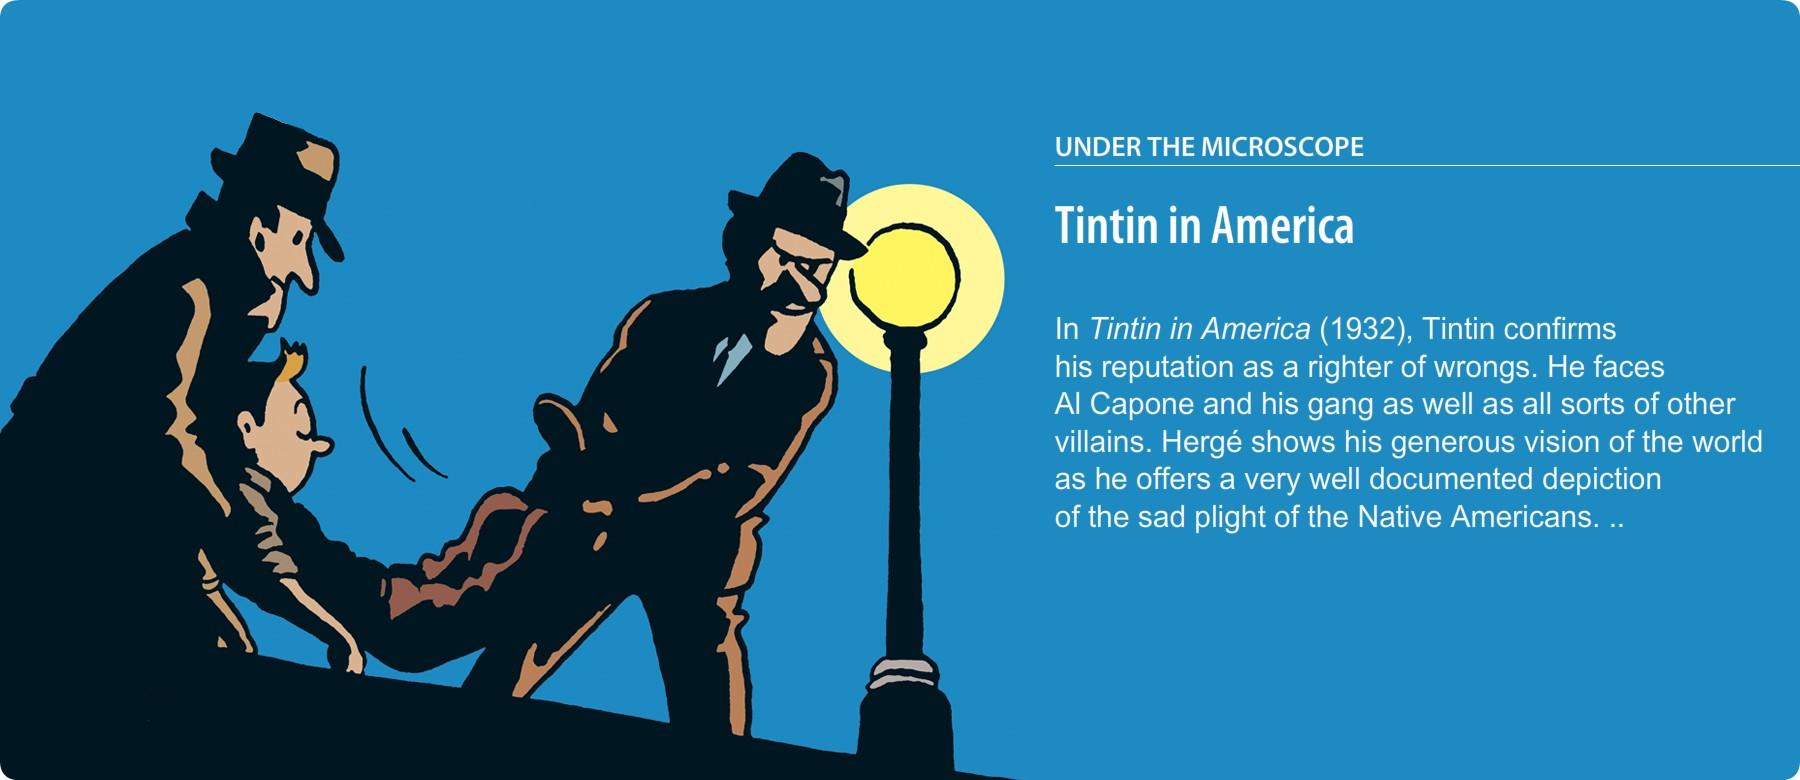 The Adventures of Tintin (2011) Subtitles - OpenSubtitles